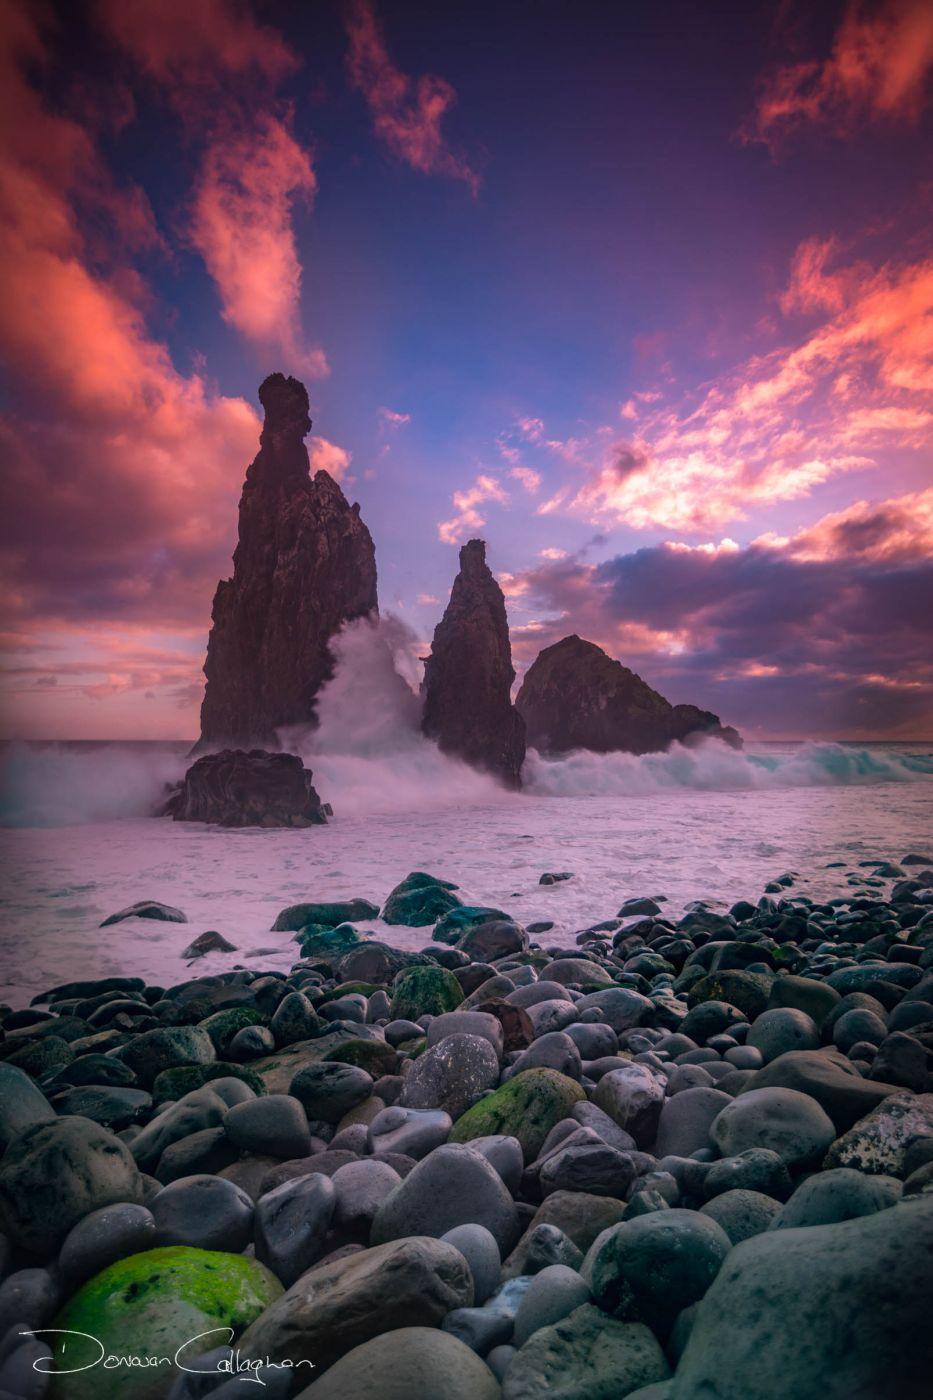 Madeira Ribeira da Janela Stacks sunrise, Portugal